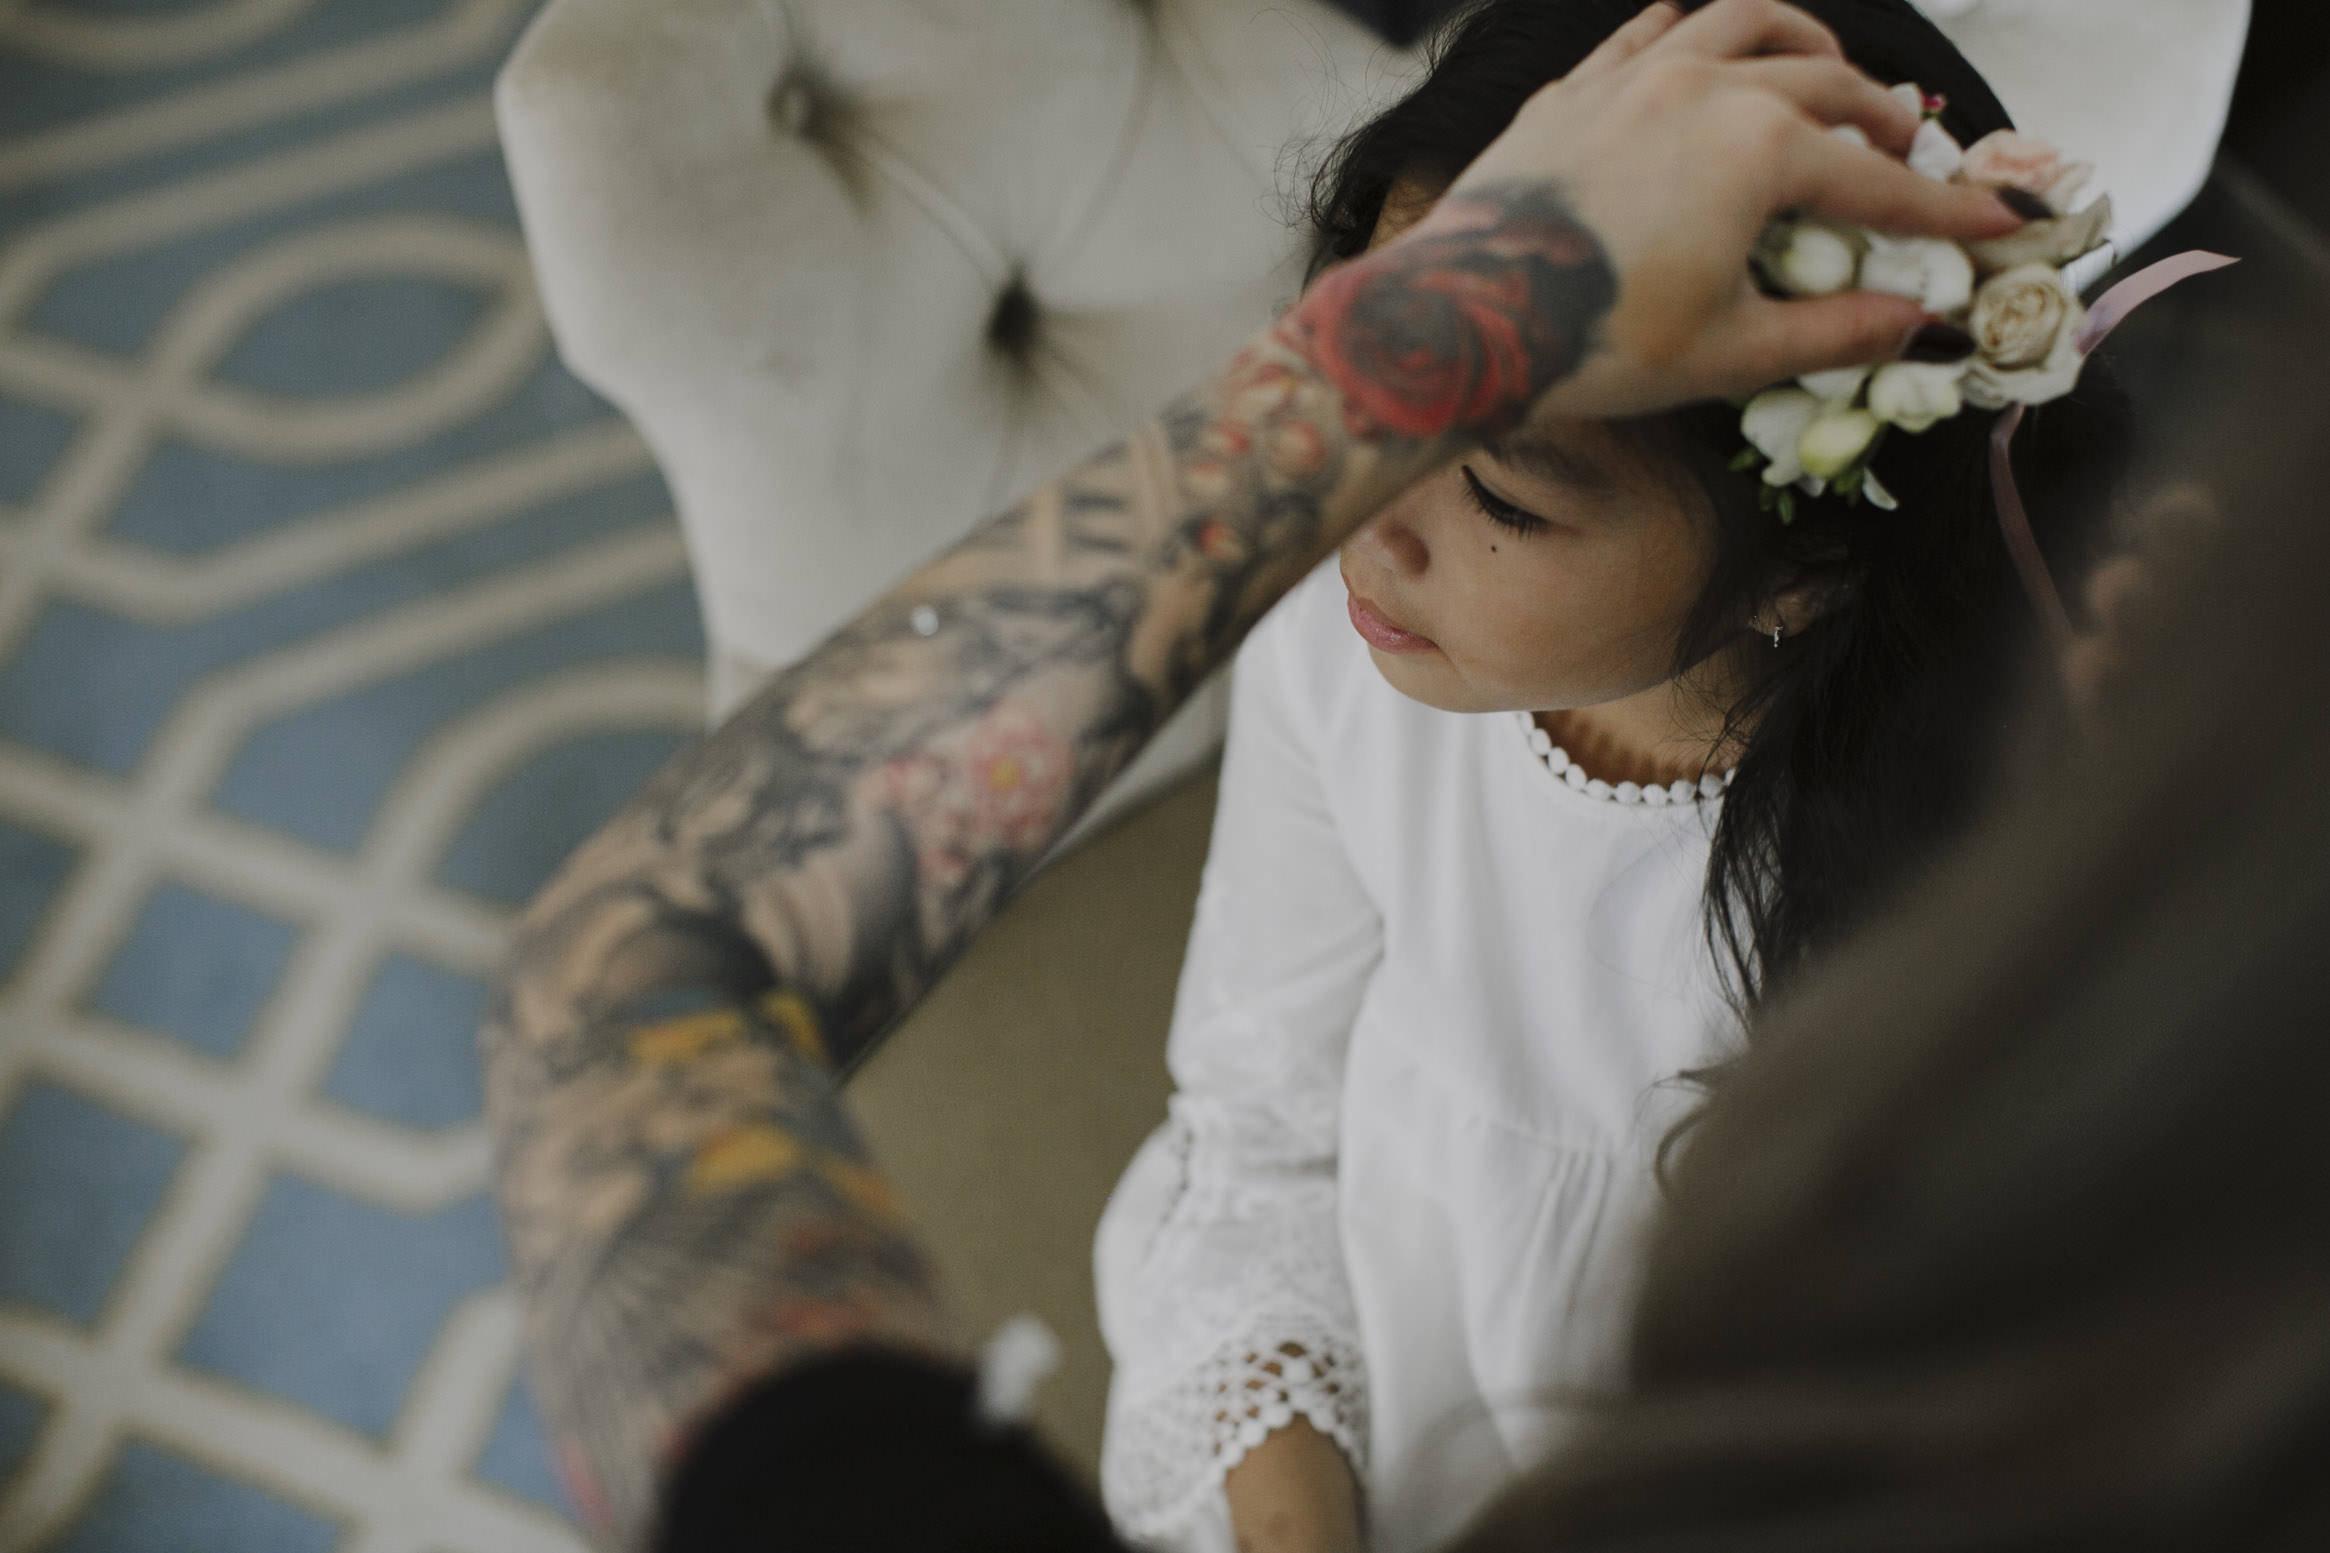 151122_justinaaron_wedding_anja_camilo_pr-15.jpg